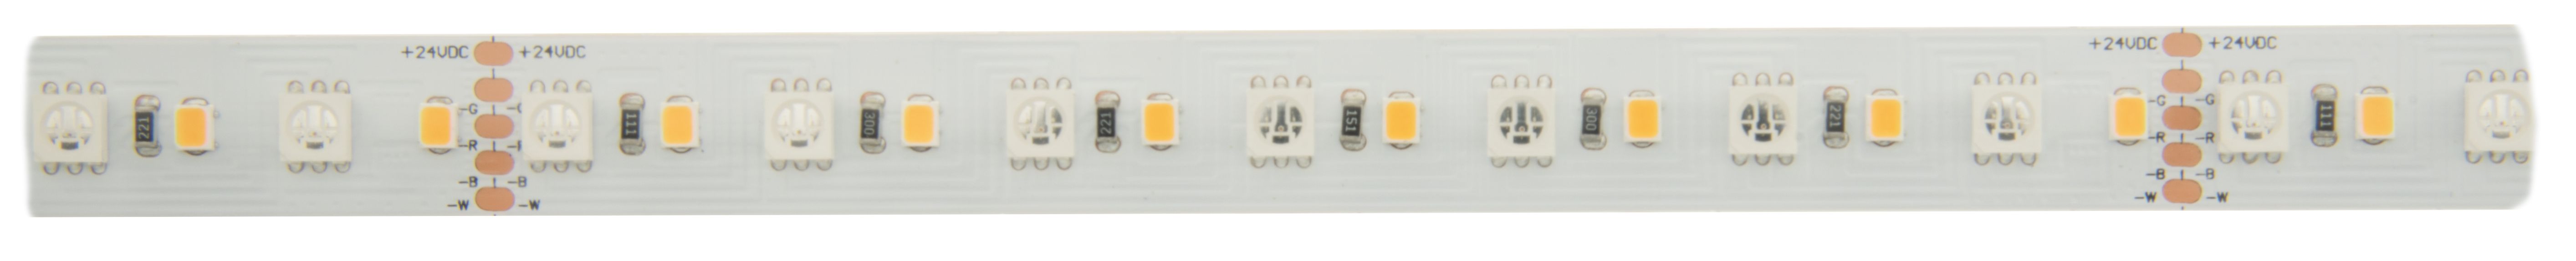 1 Stk Flexstrip 115 RGB-UWW 90+ 13,5W/m 1023lm/m 24VDC IP44 l=5m LIFS009105